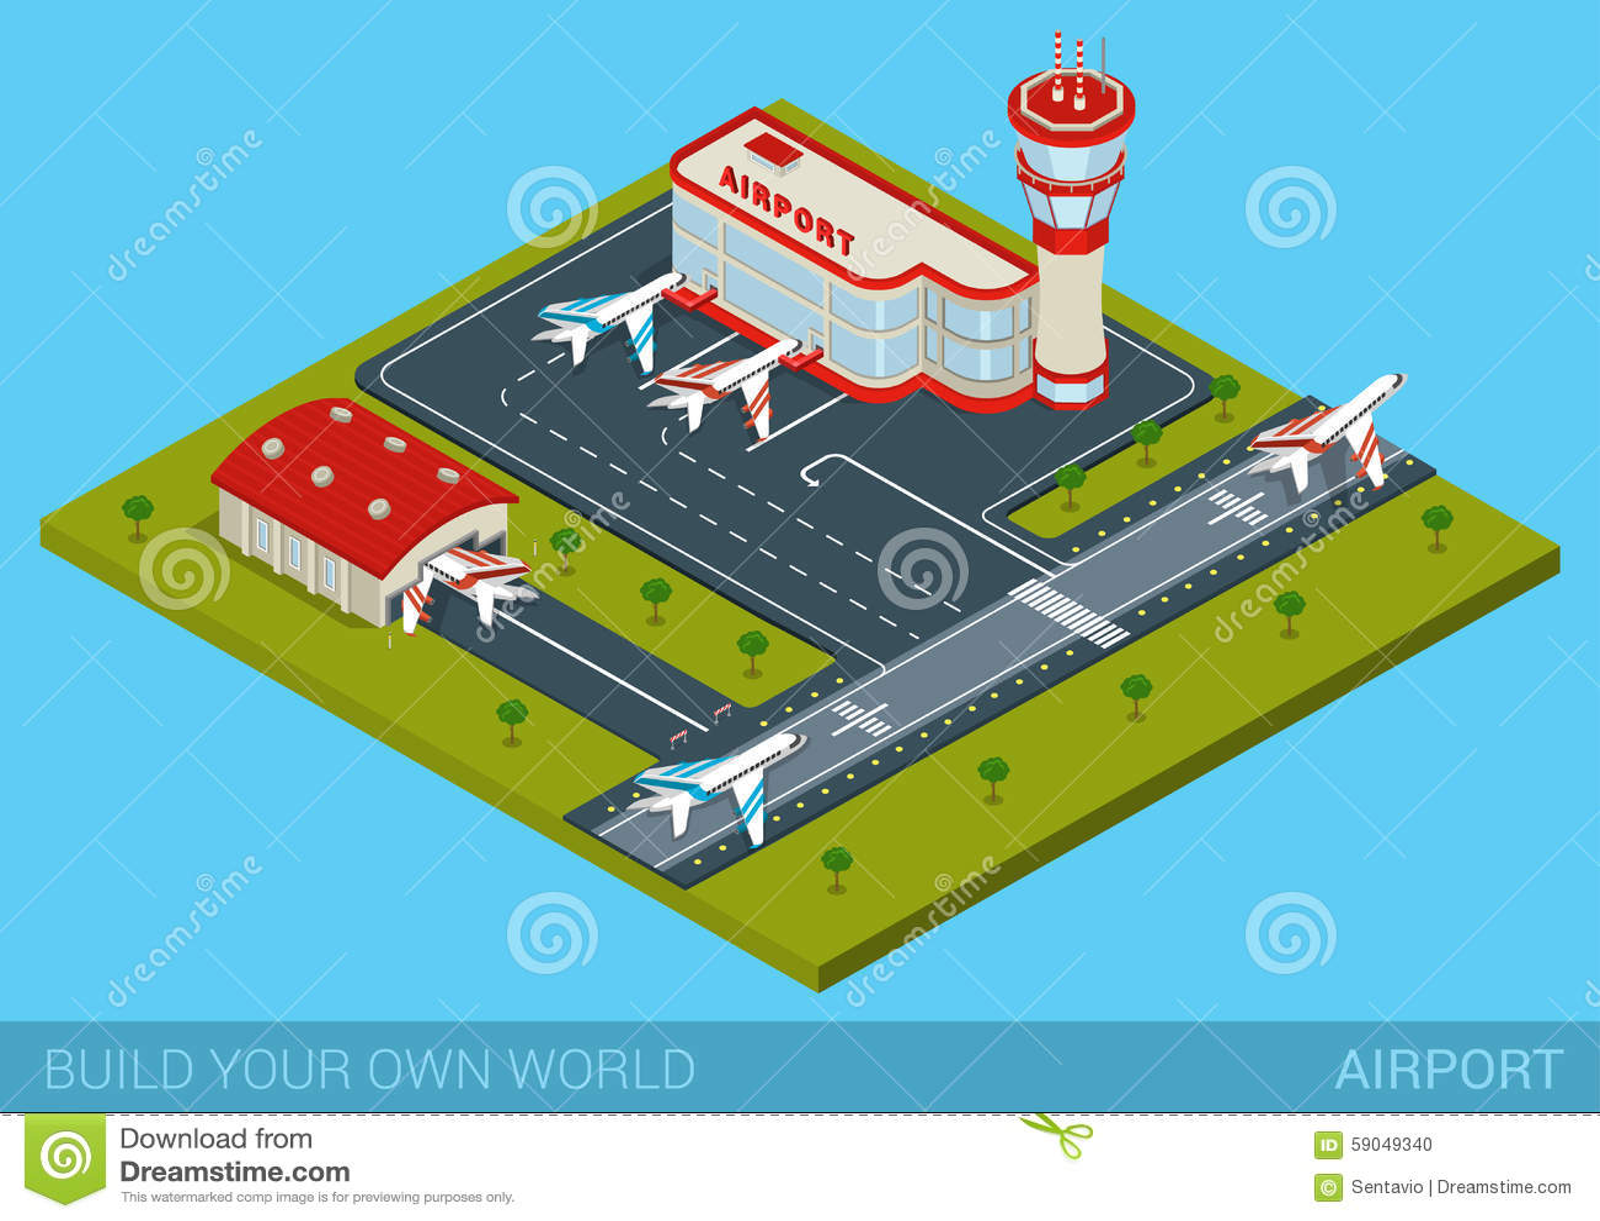 Flat isometric style airport building, hangar, runway, airplanes